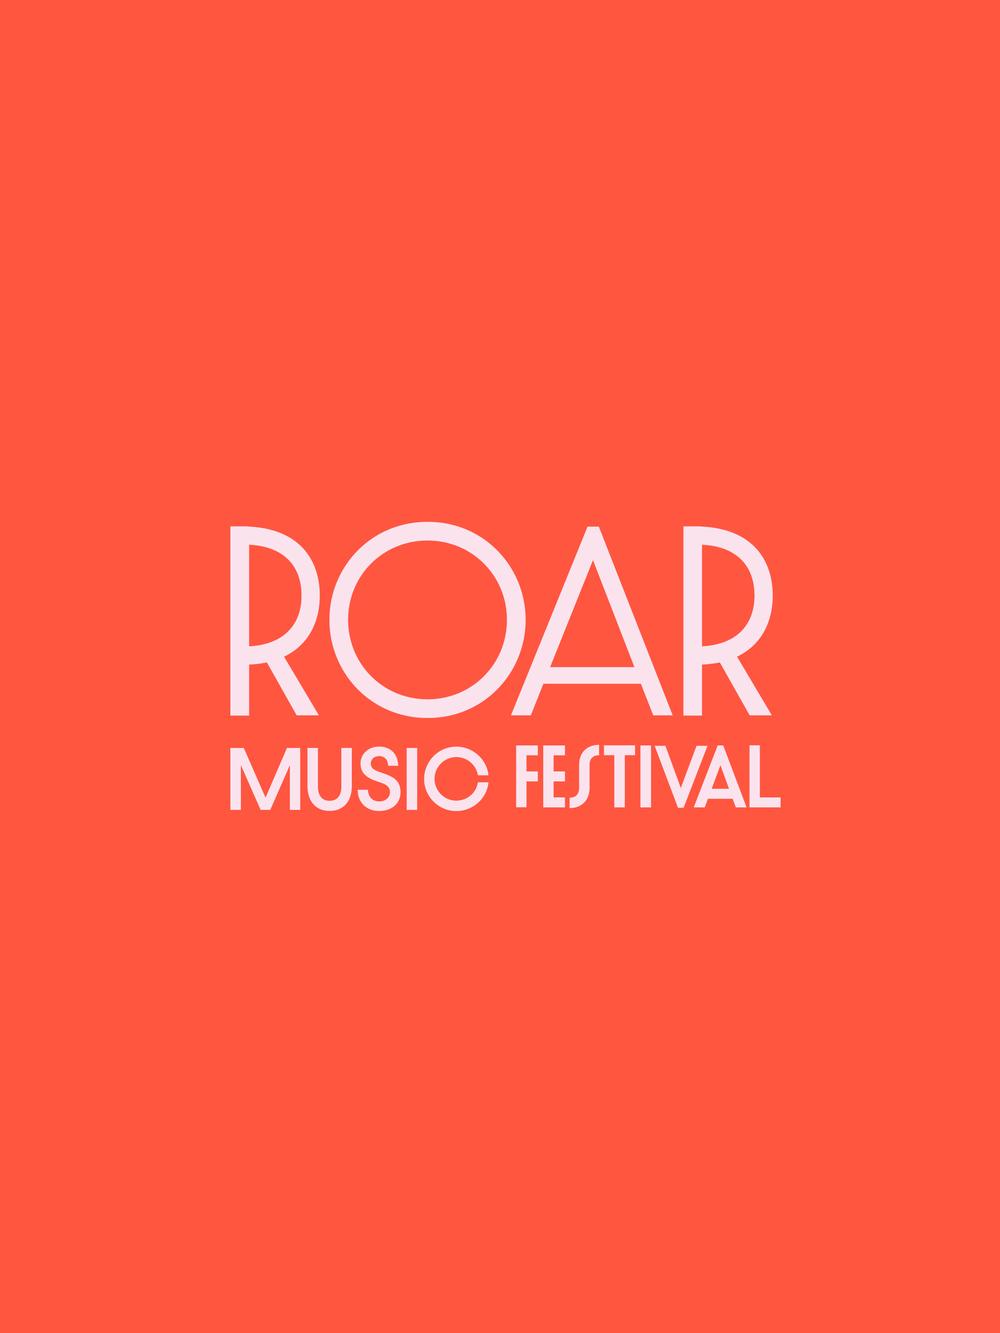 RoarFestival_WeblayoutPortfolio_27Aug2017-02.png